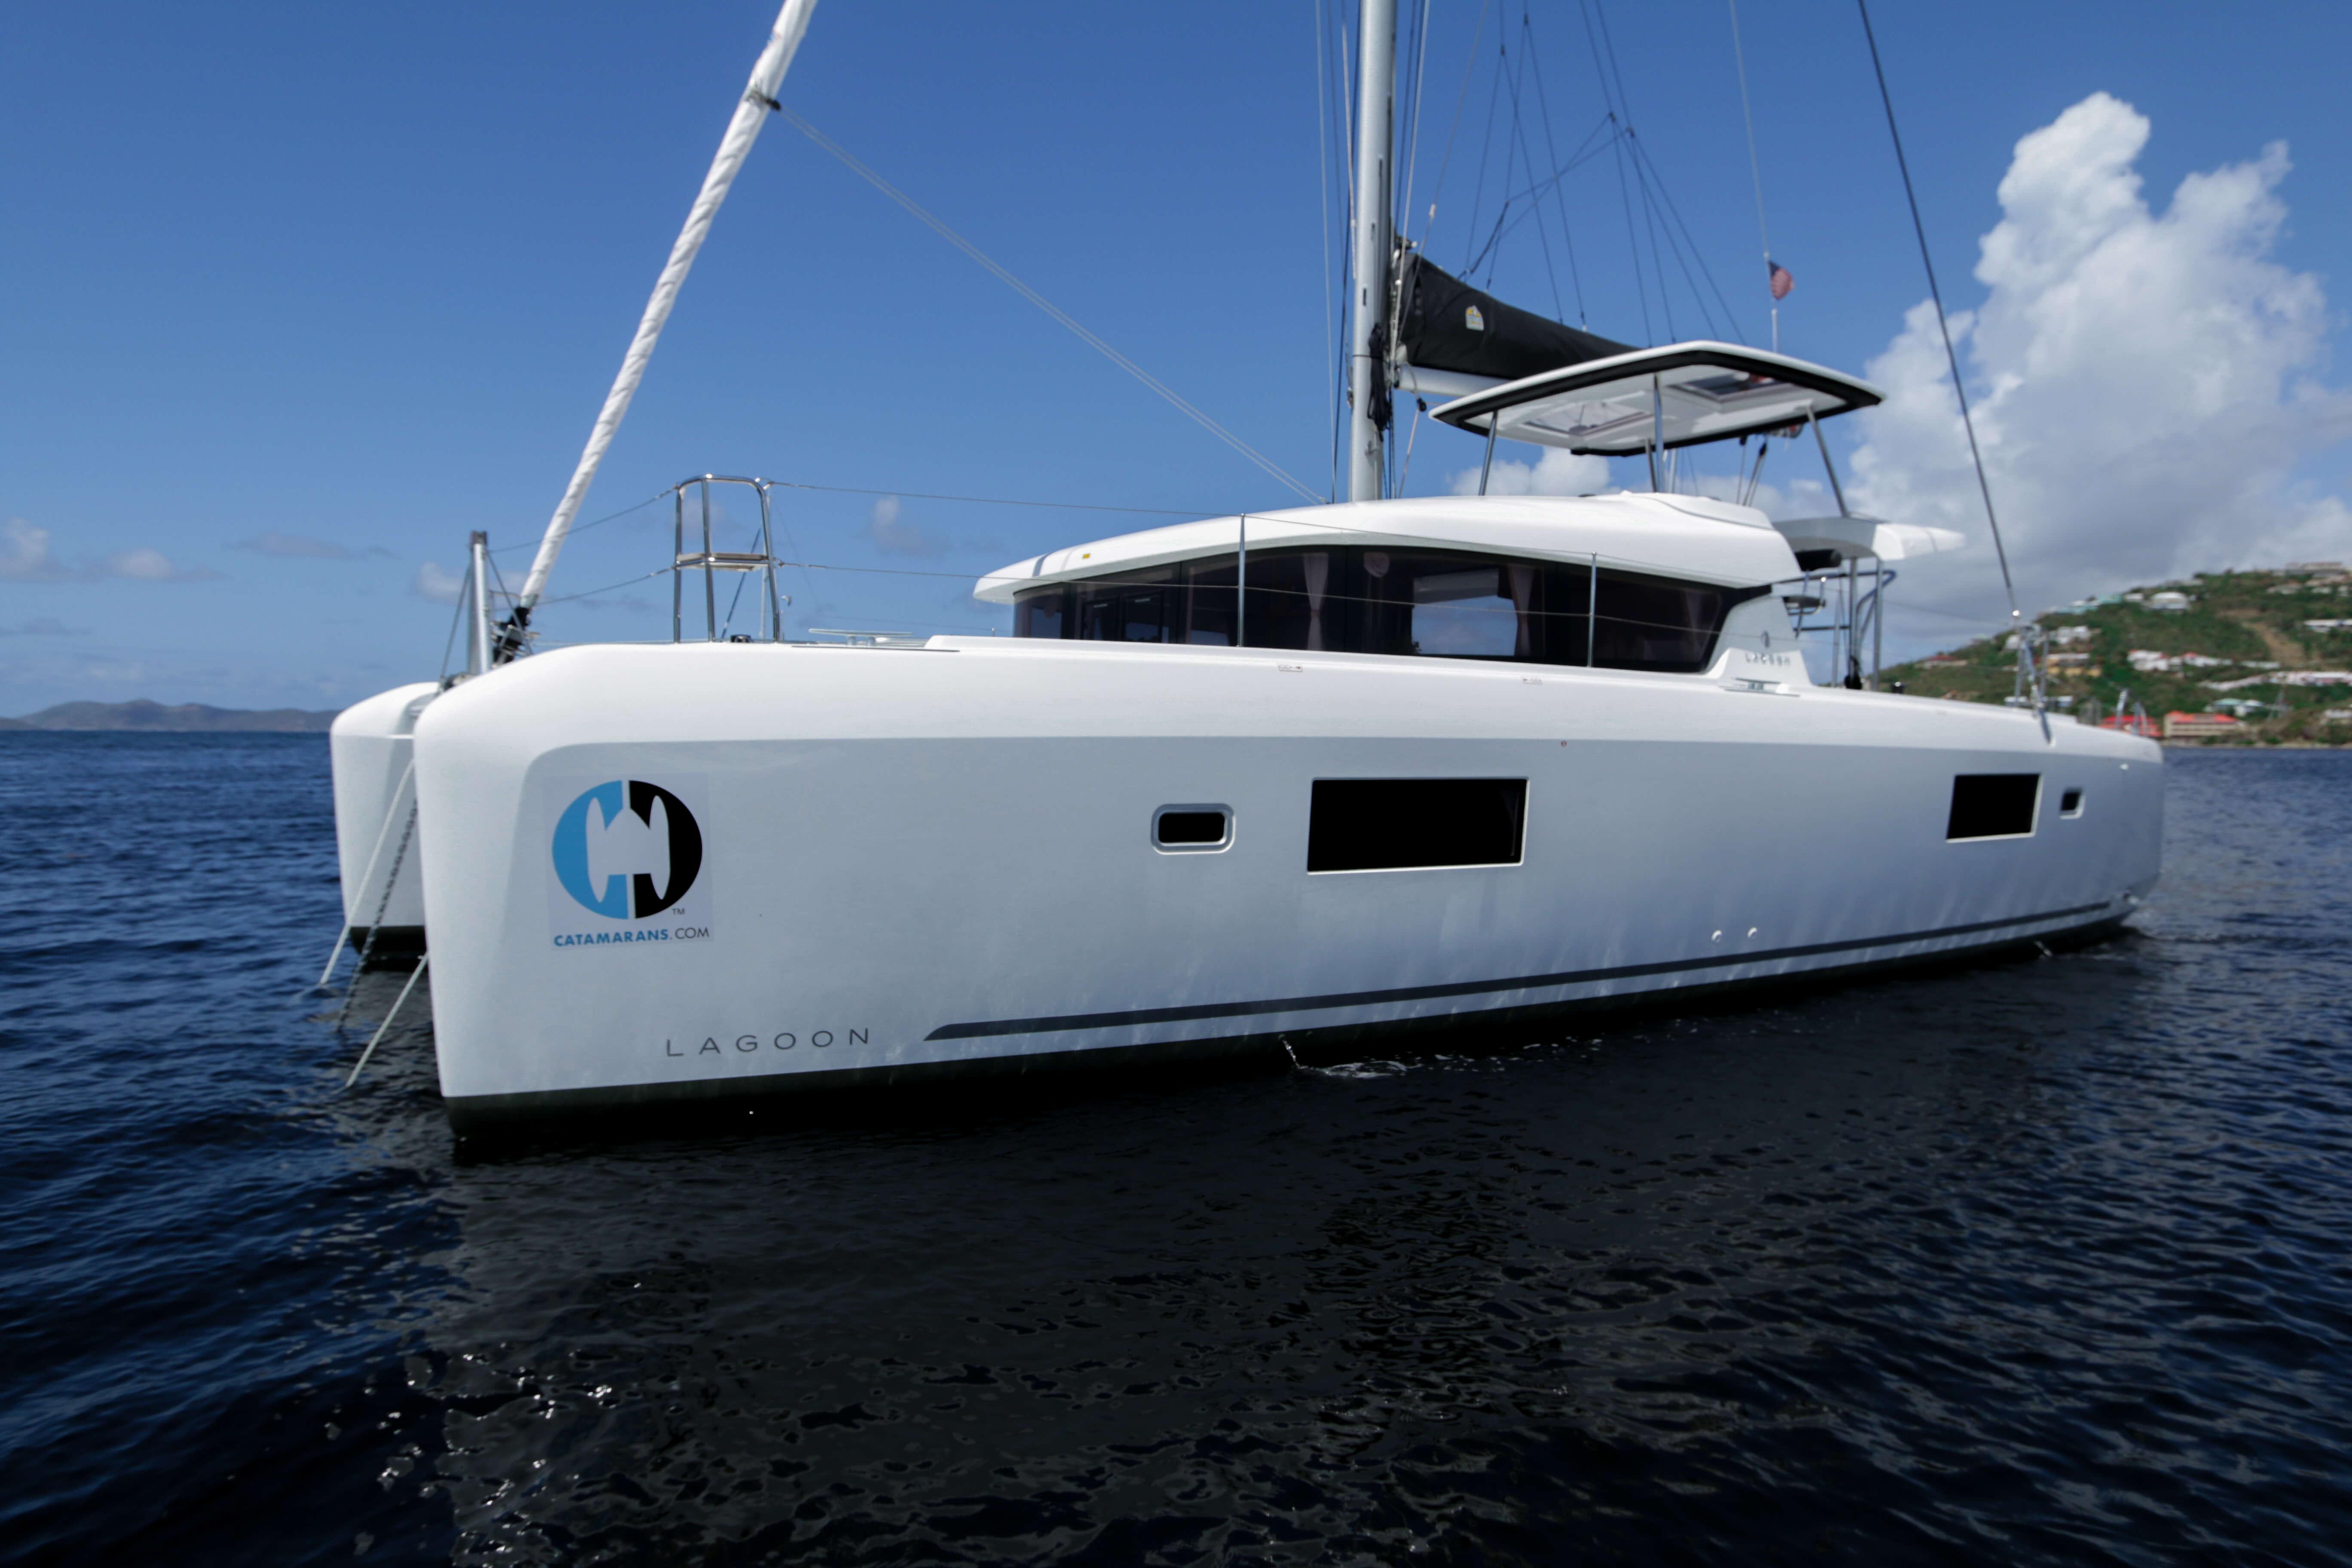 Used Sail Catamaran for Sale 2018 Lagoon 42